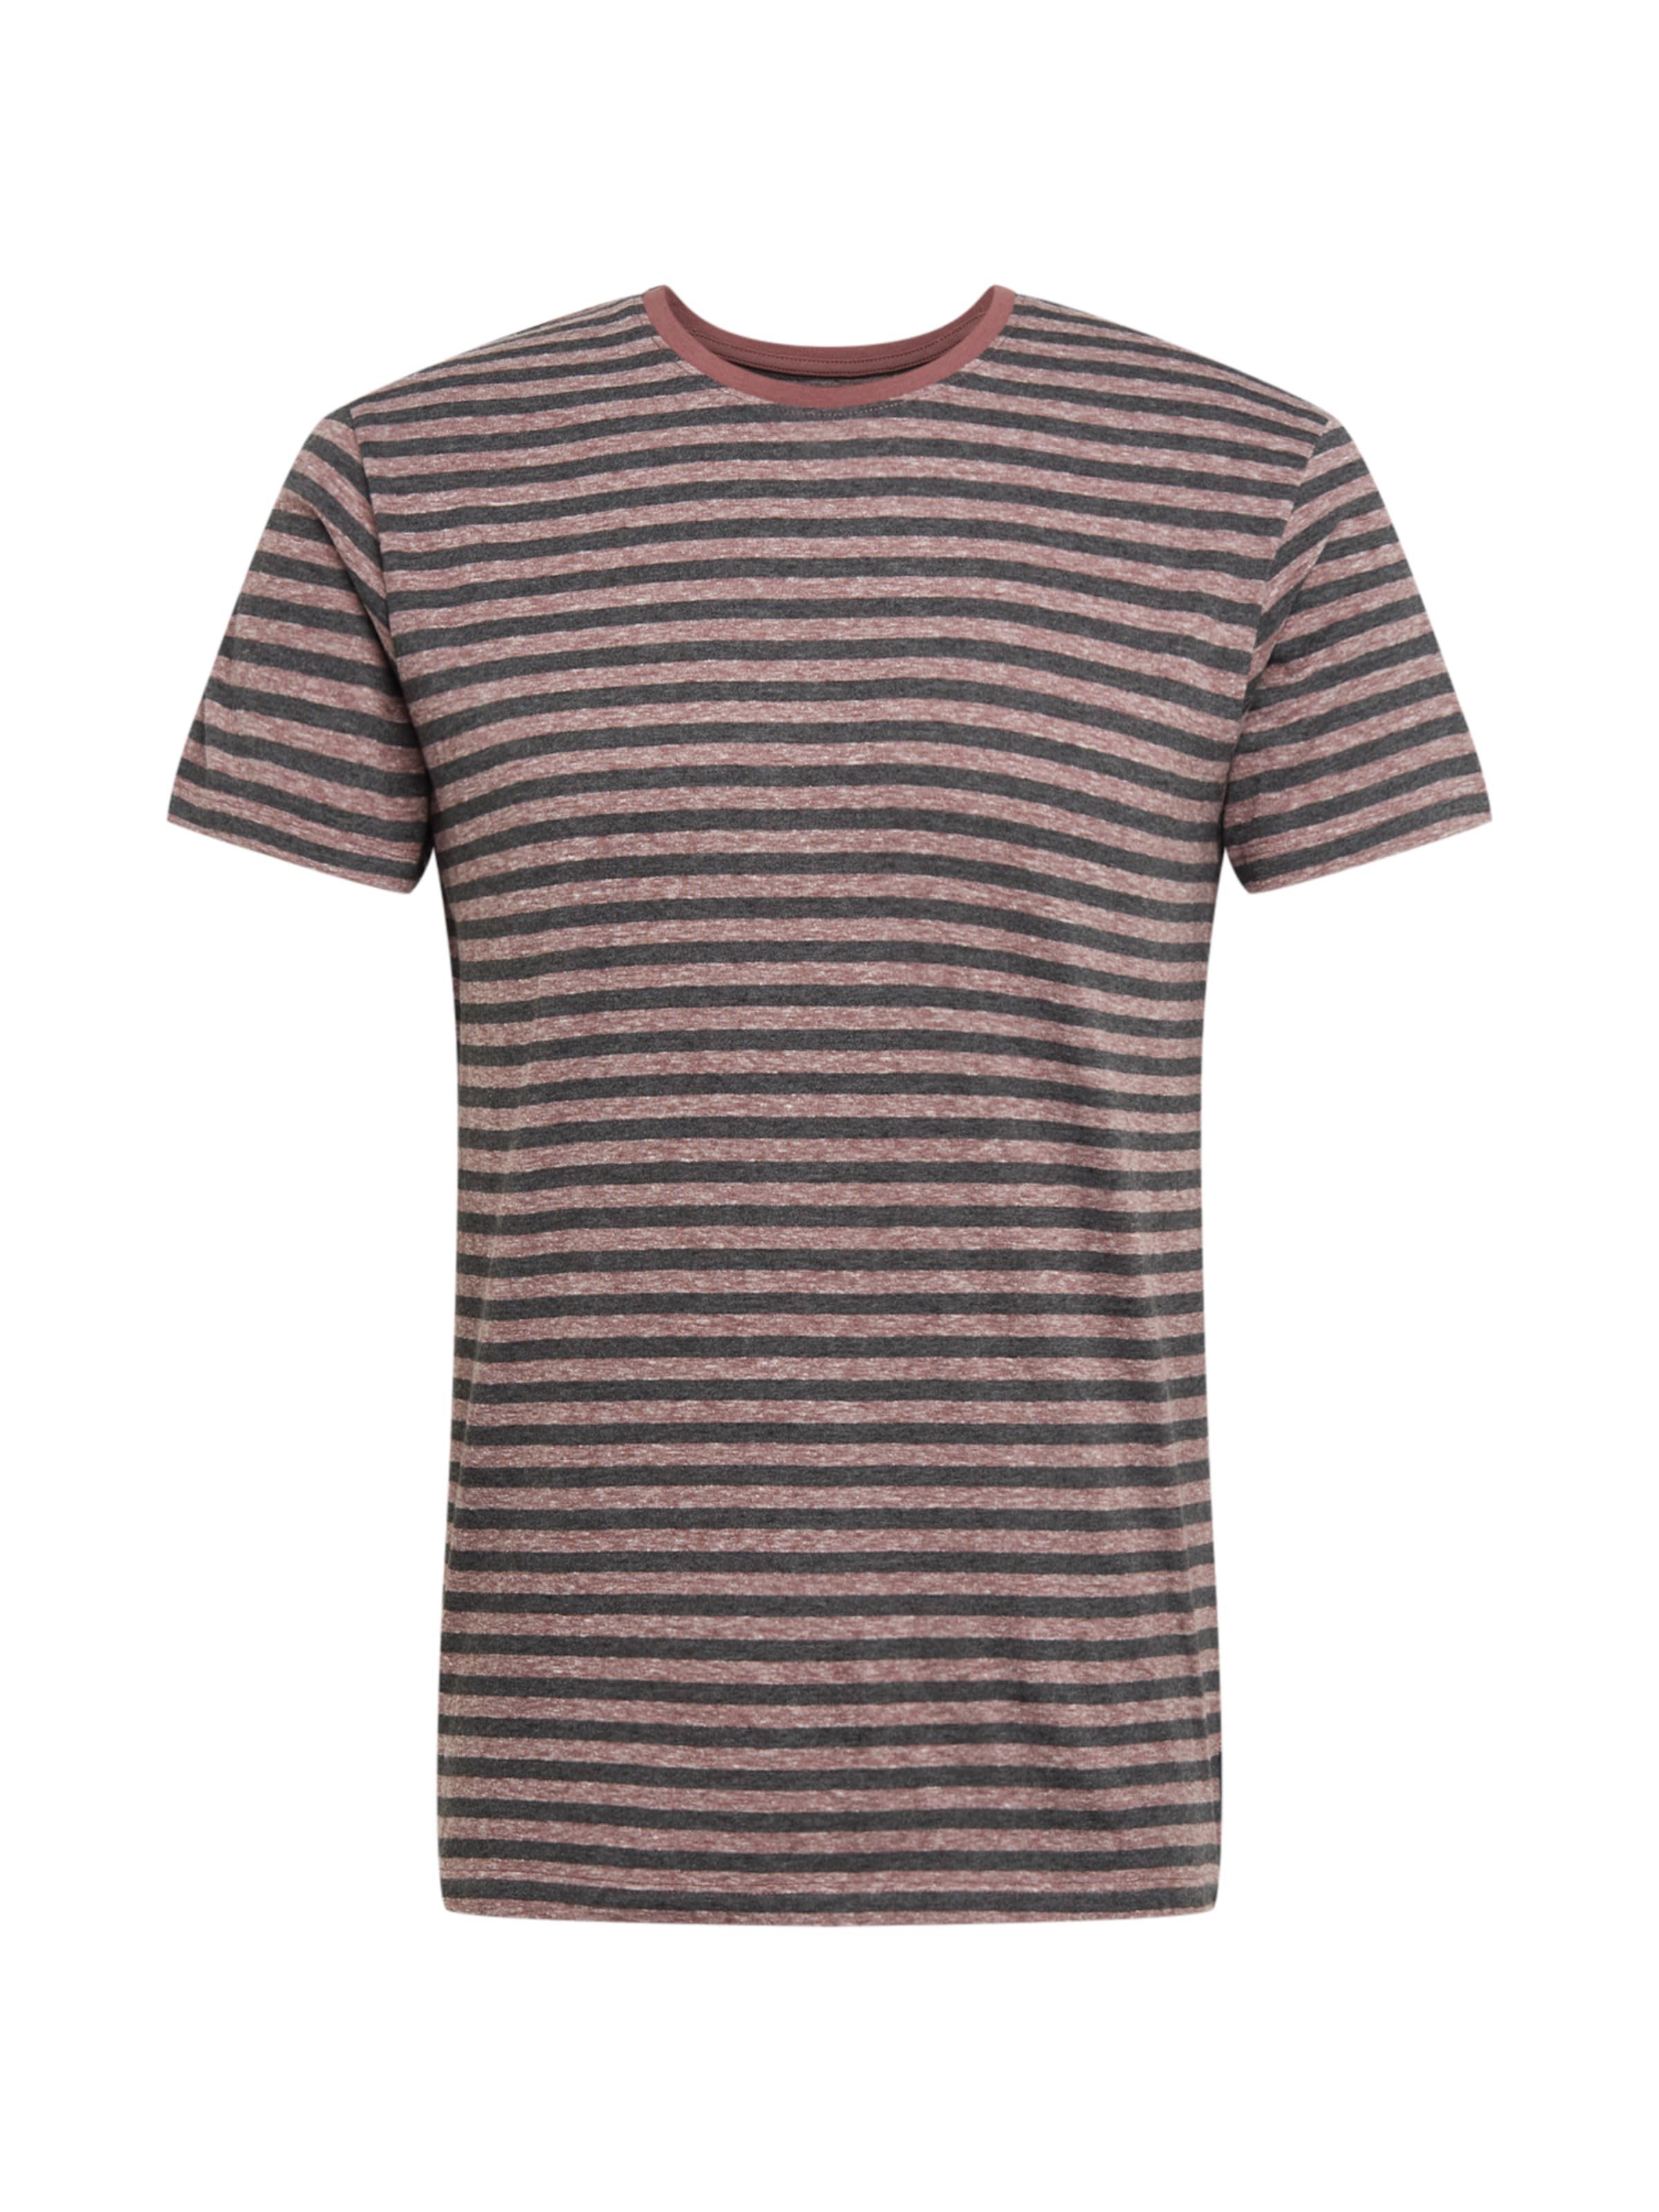 Shirt In Edc By 'sg GrauRot 089cc2k014' Esprit I76vYgybf